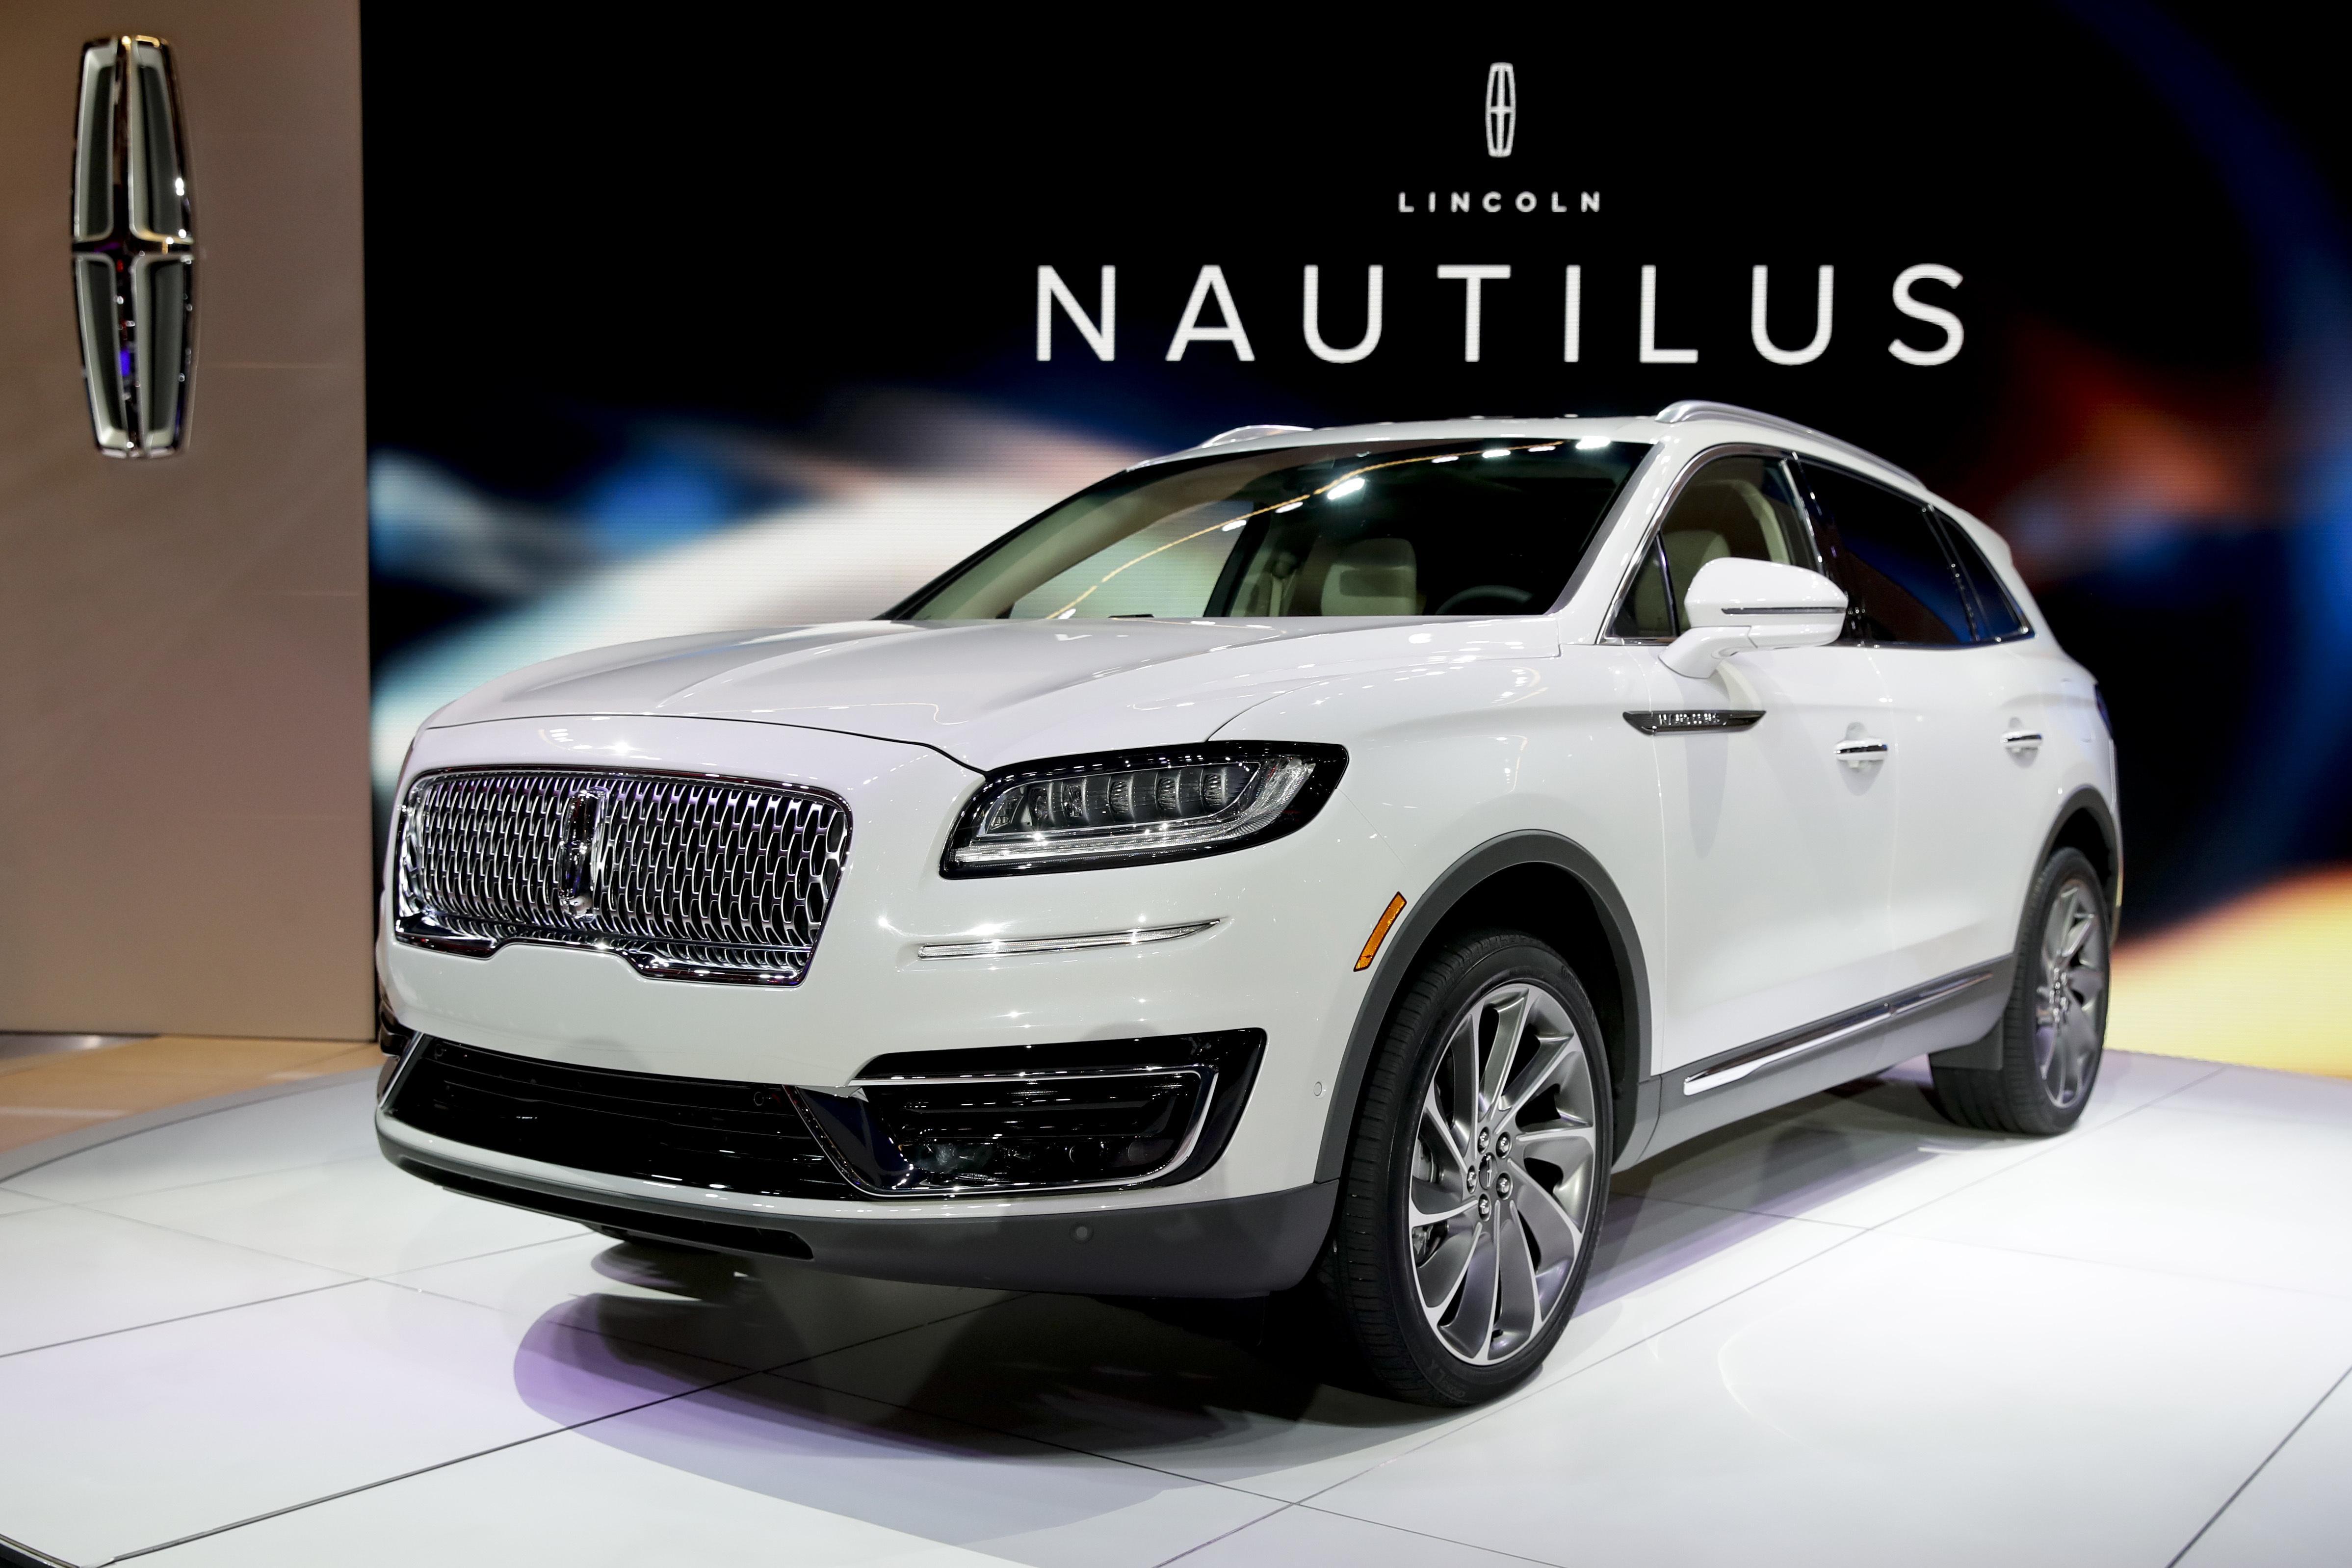 SUVs are main attraction at L.A. Auto Show | The Spokesman-Review